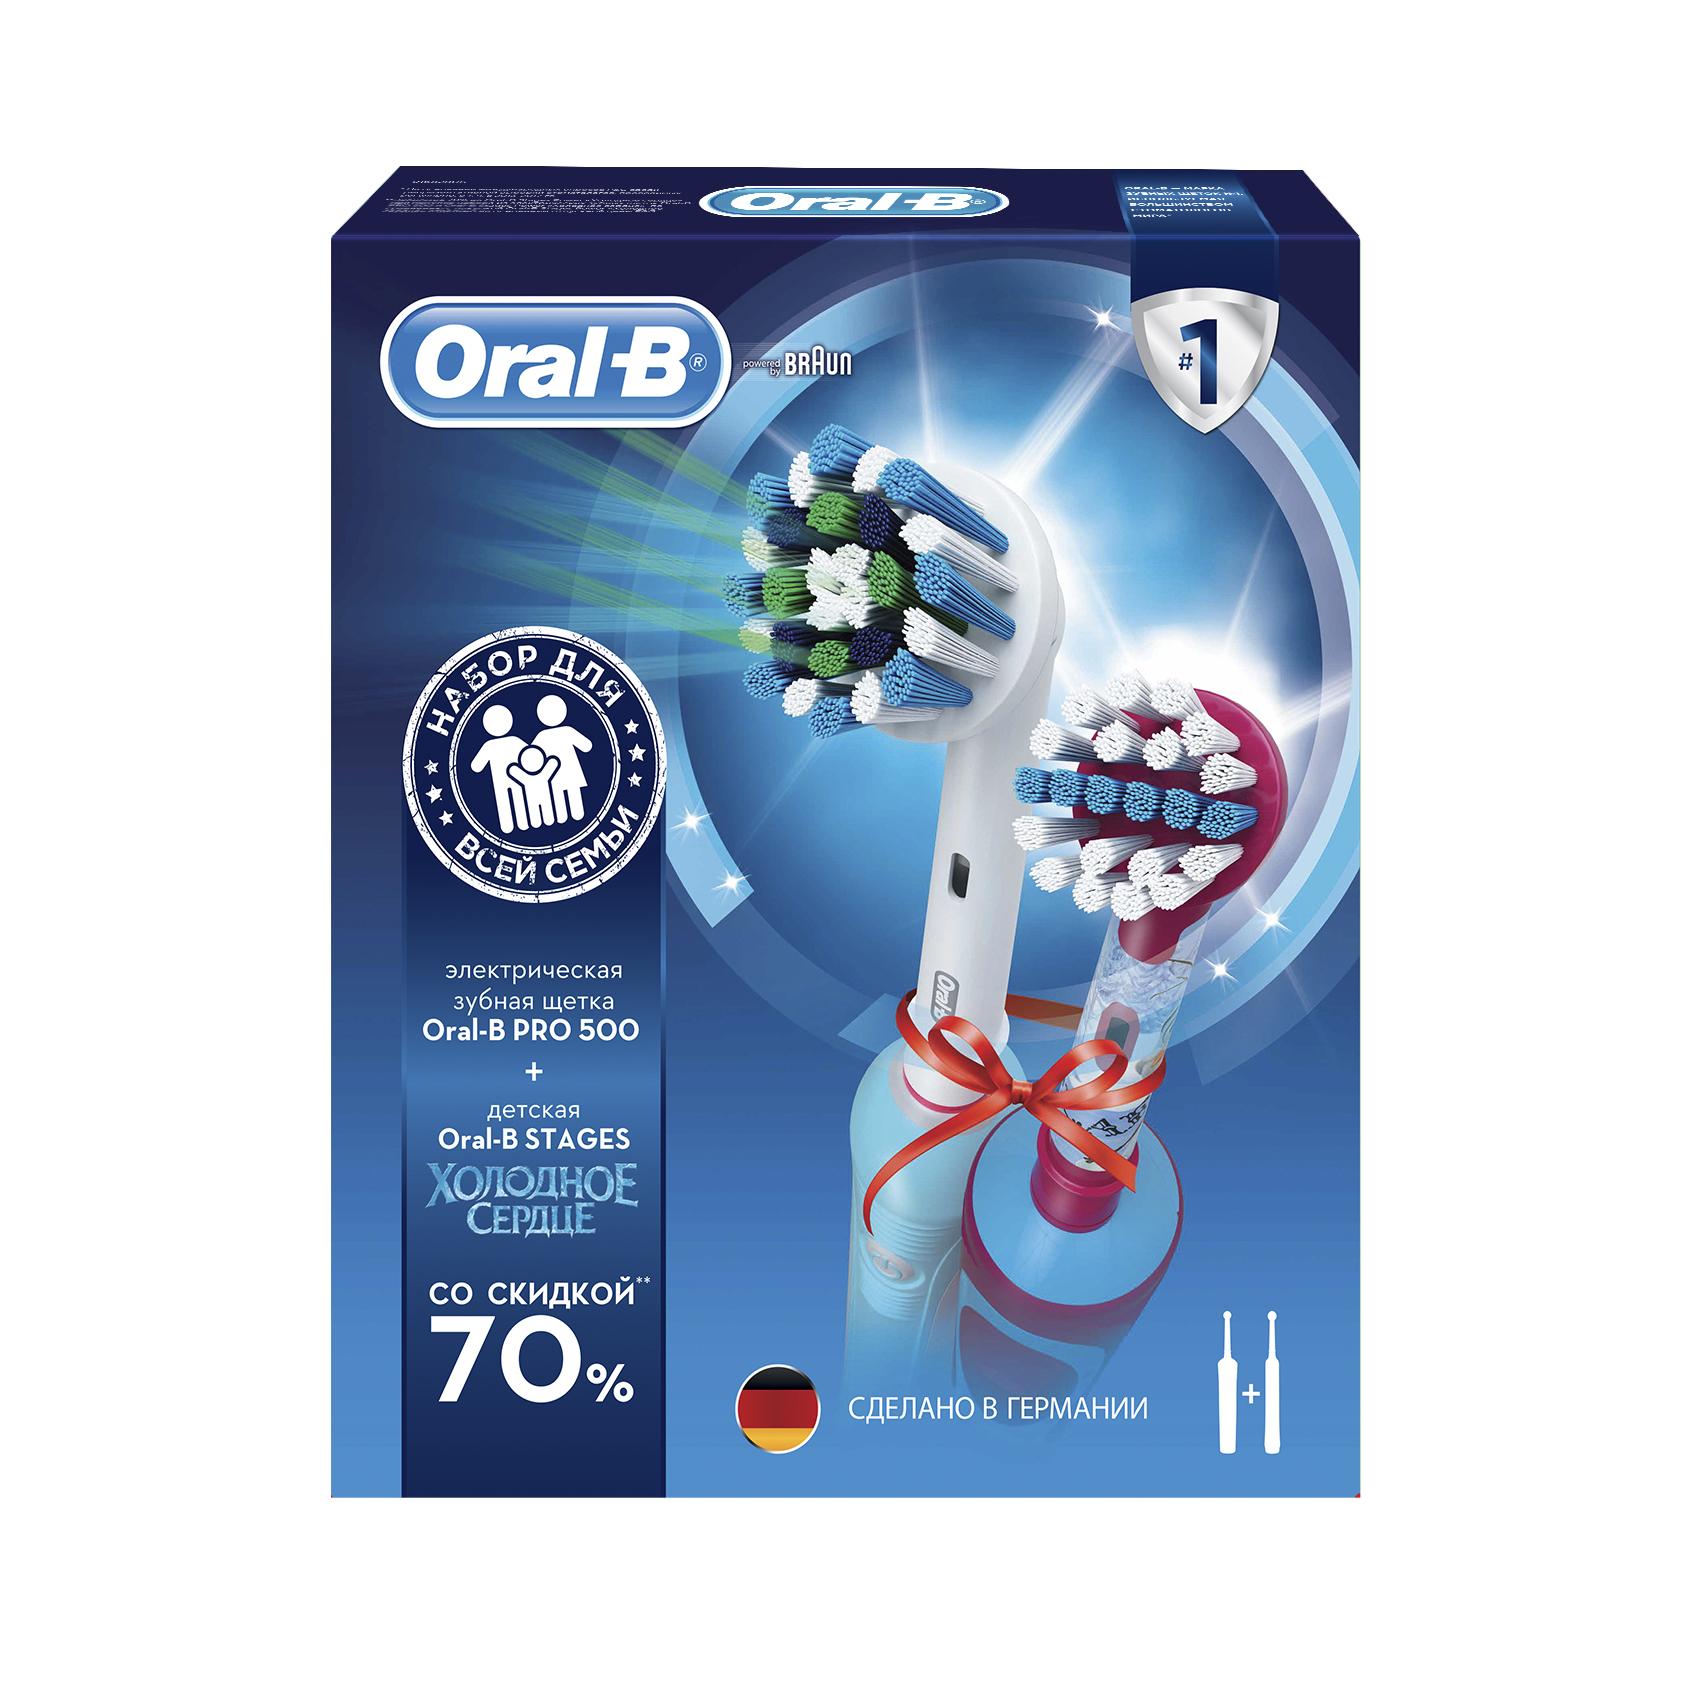 ORAL-B PC 500/D16 + VITALITY D12.513K FROZEN KIDS